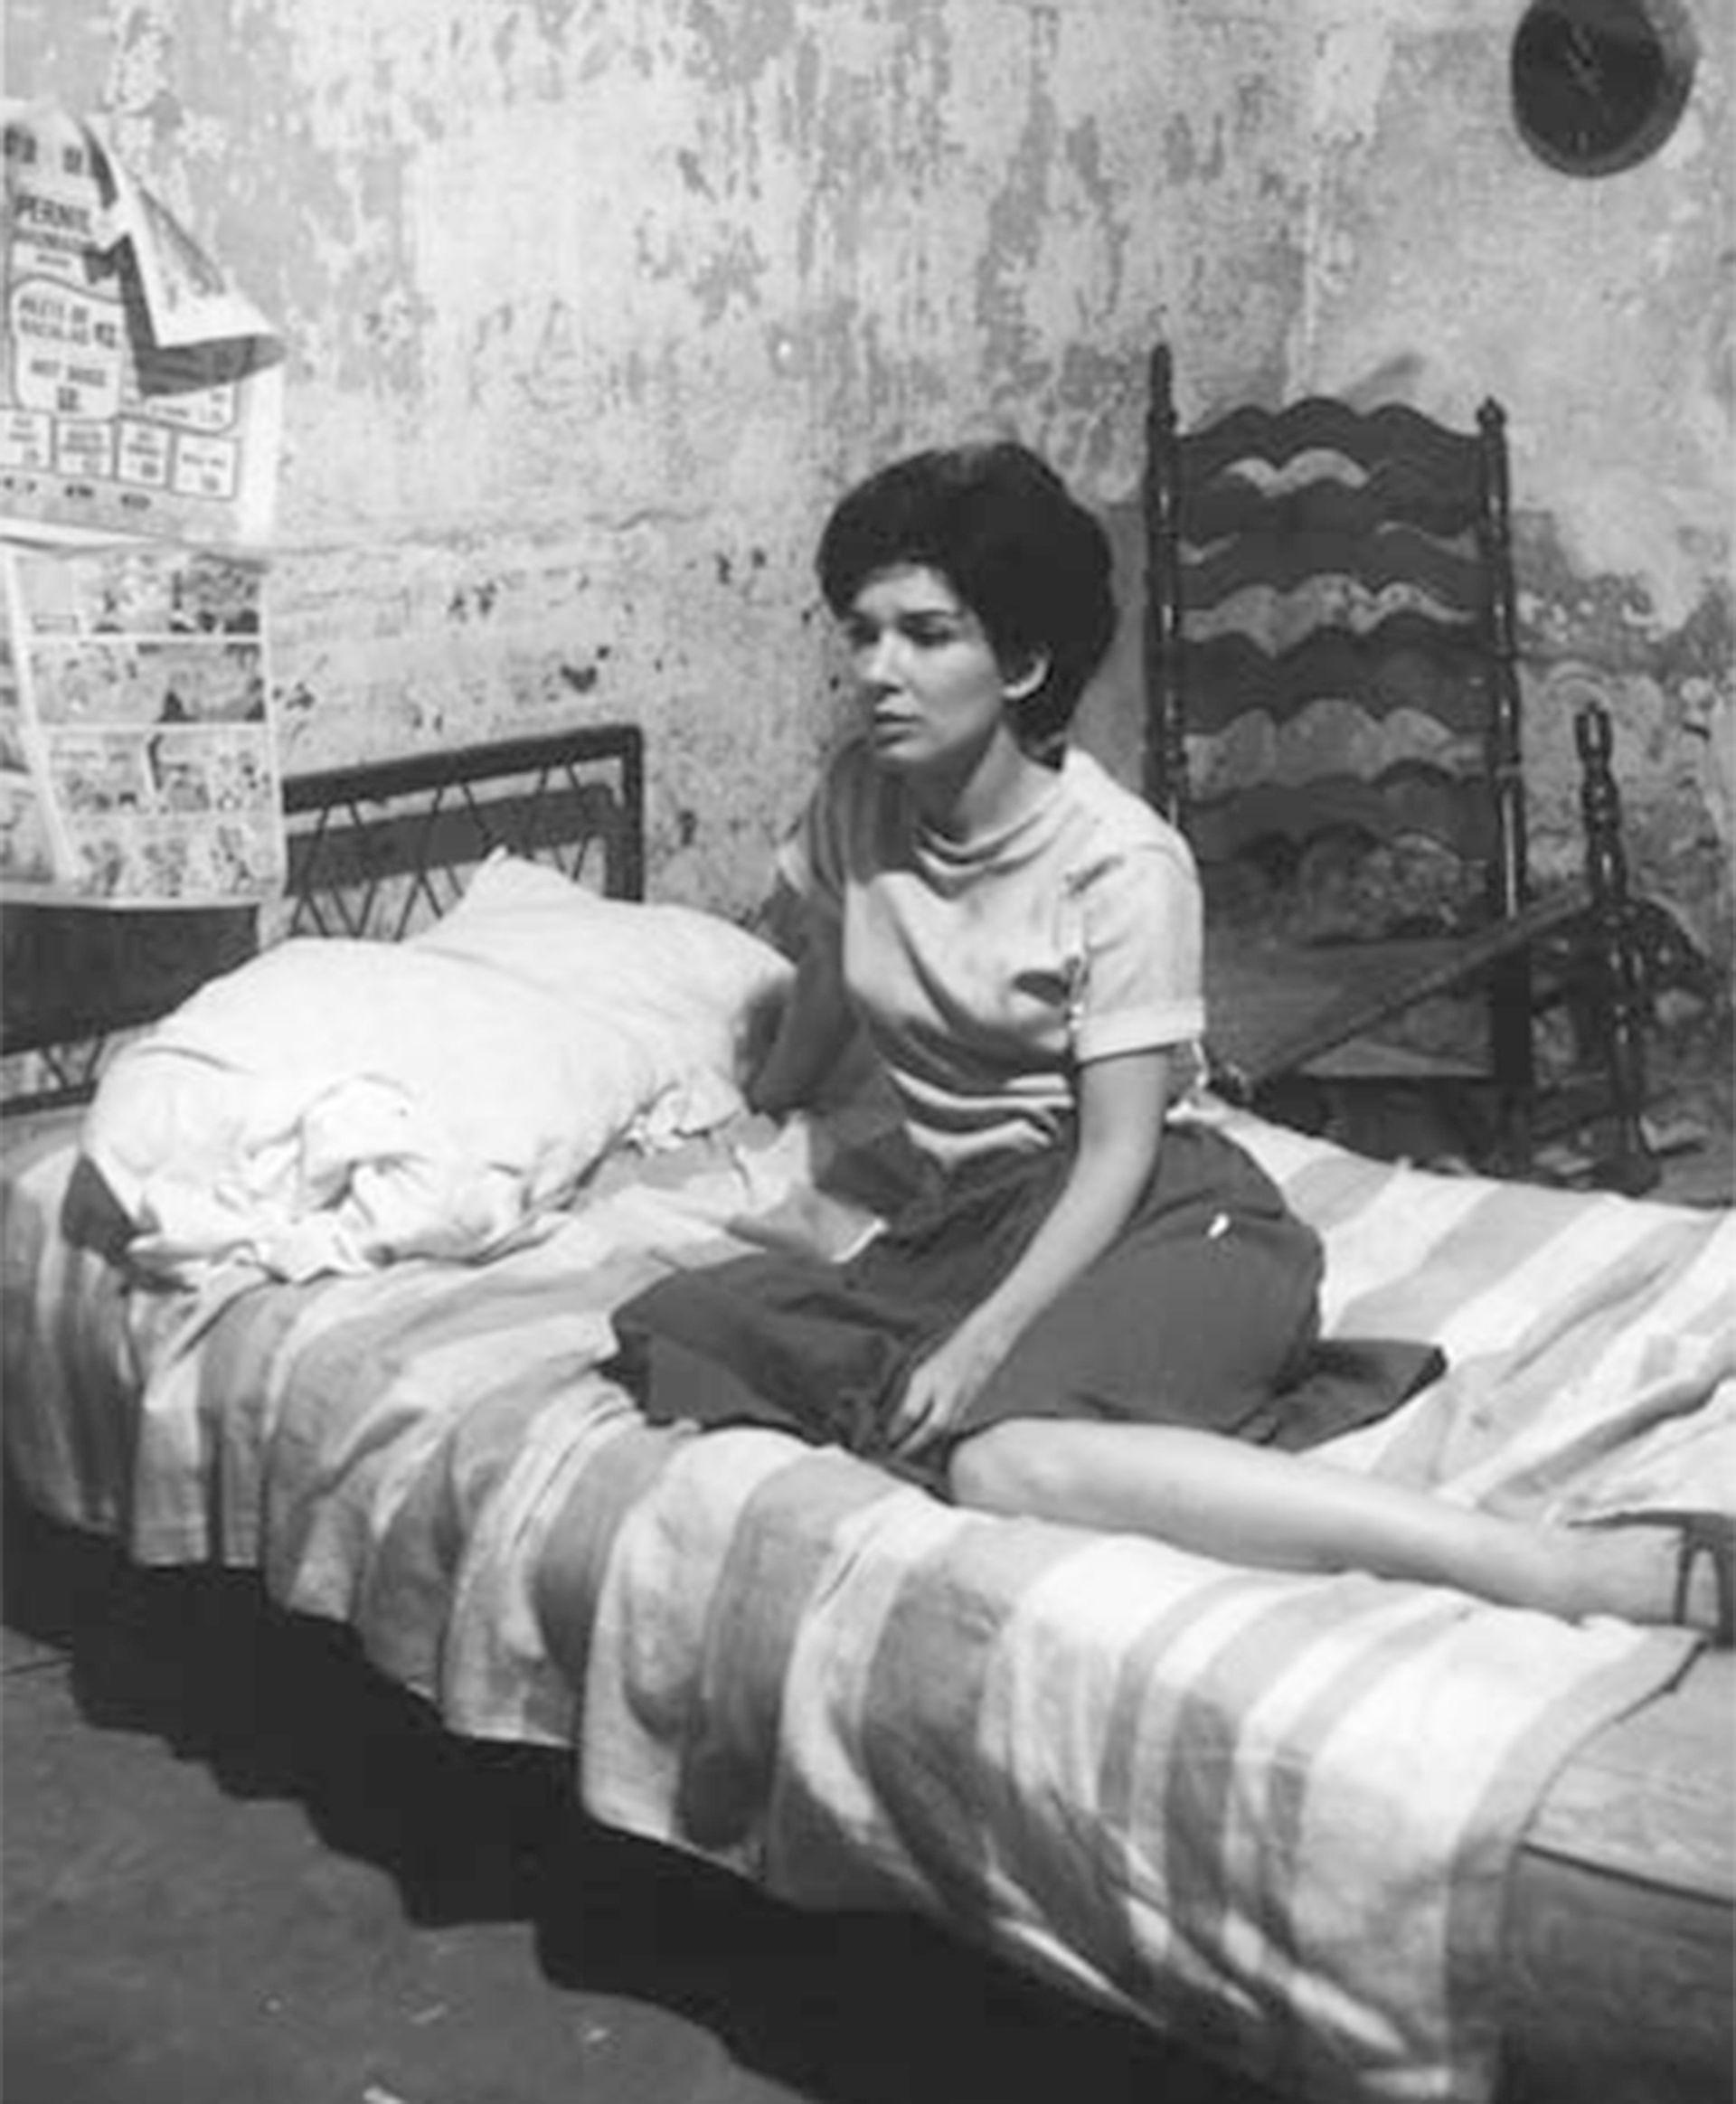 Graciela Borges en La chica del lunes (1967)